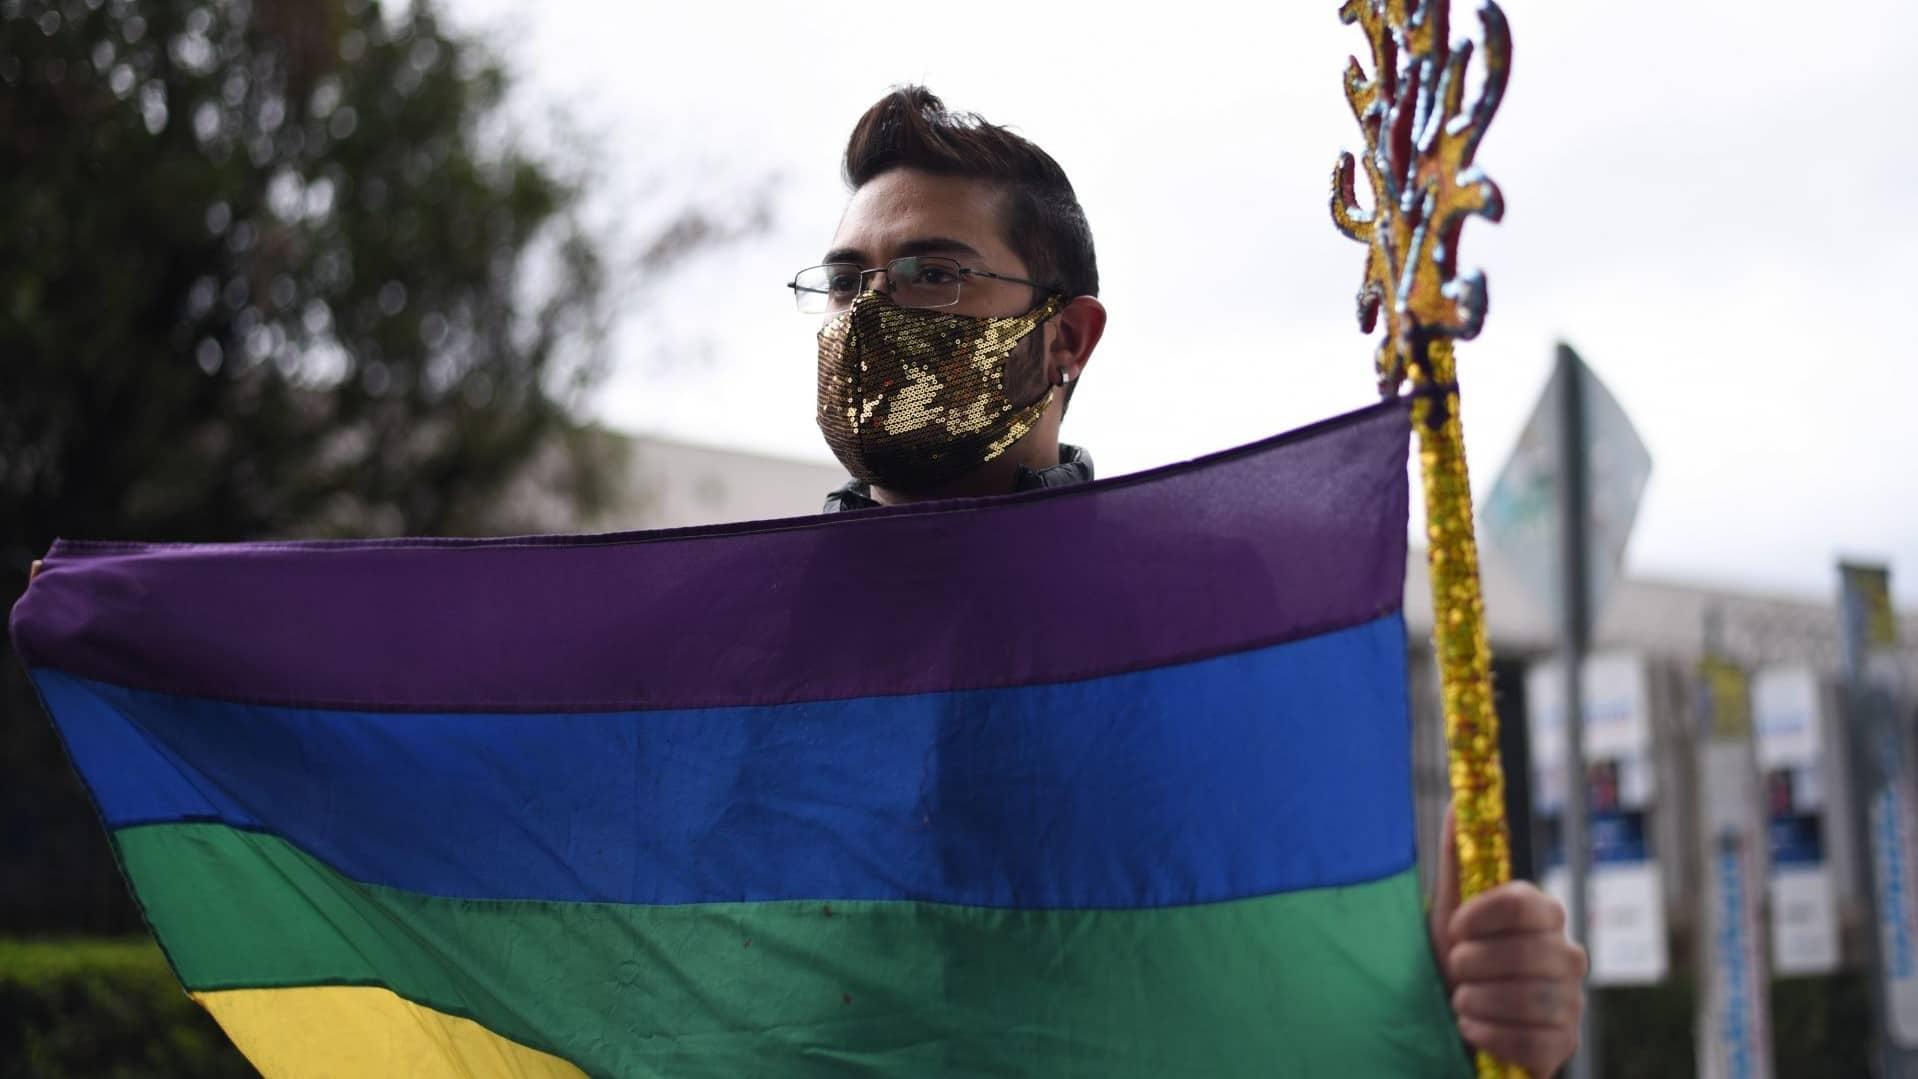 Asesinatos contra comunidad LGBT en México bajan por pandemia